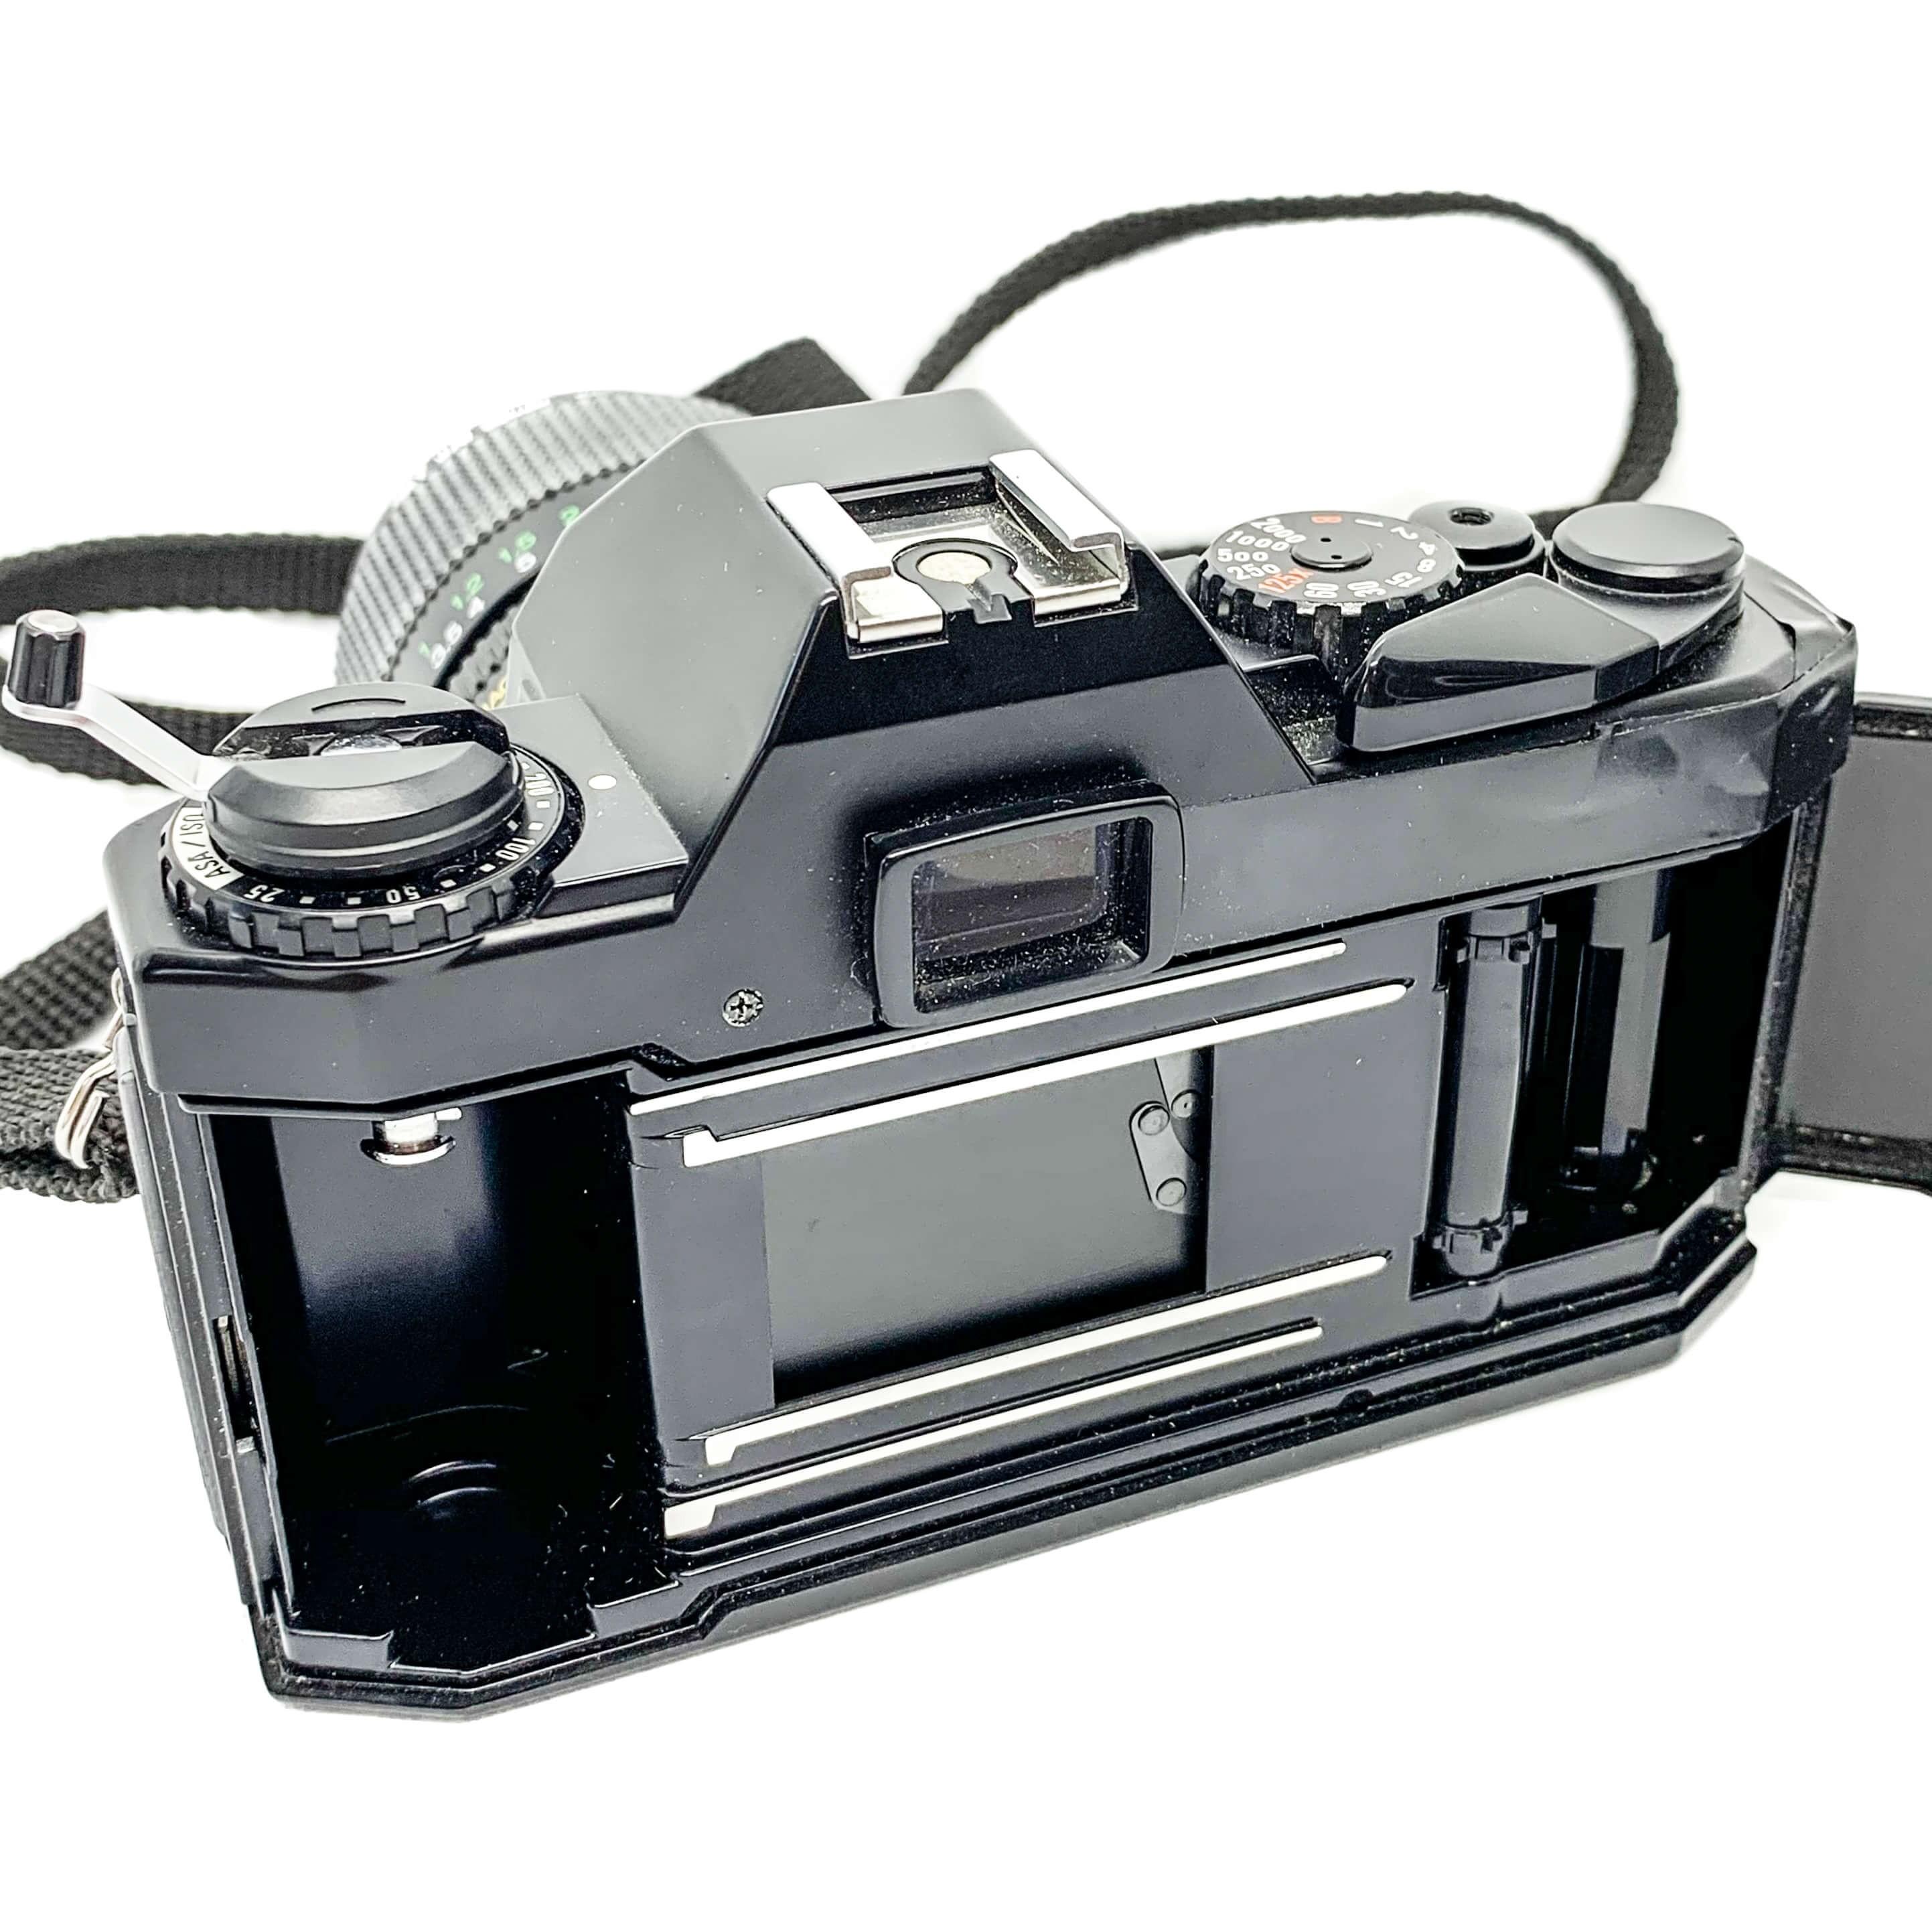 Stunning Vivitar V335 35mm Film camera +28-70mm Lens (Tested and Working)